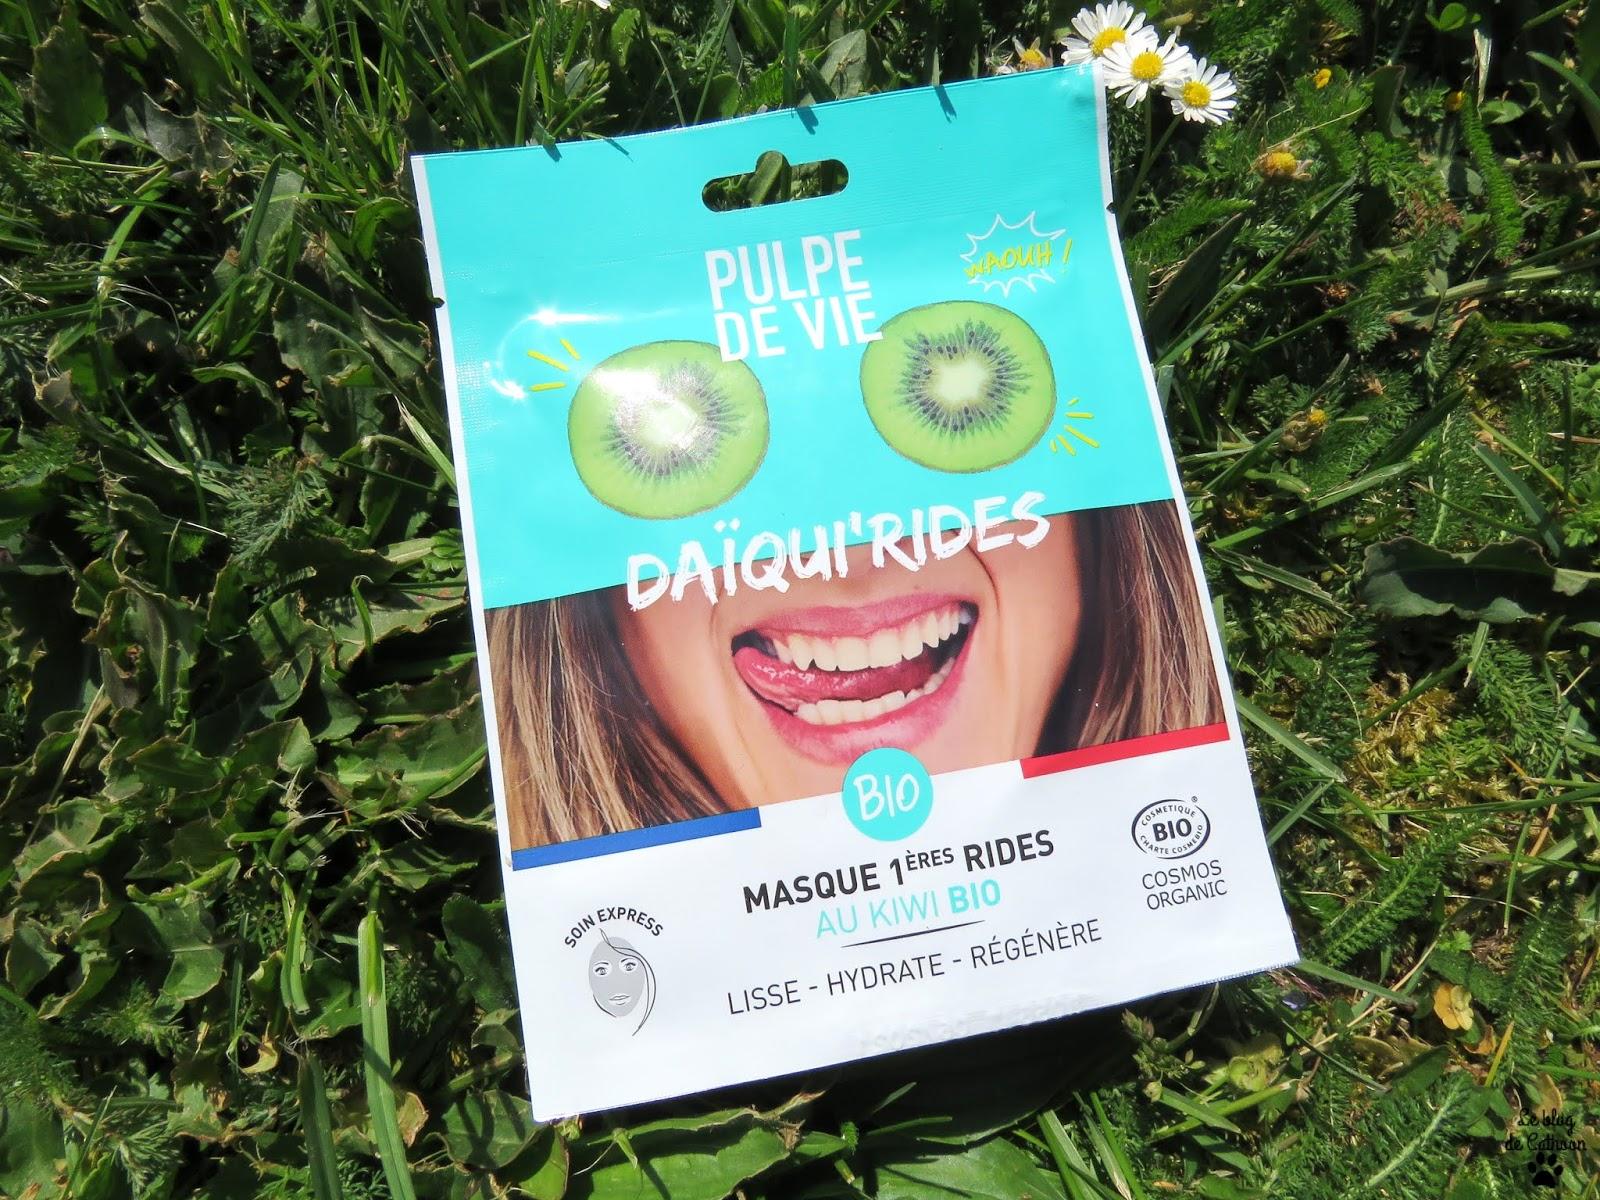 Daïqui'rides - Masque Kiwi Bio - 1ères Rides - Pulpe de Vie